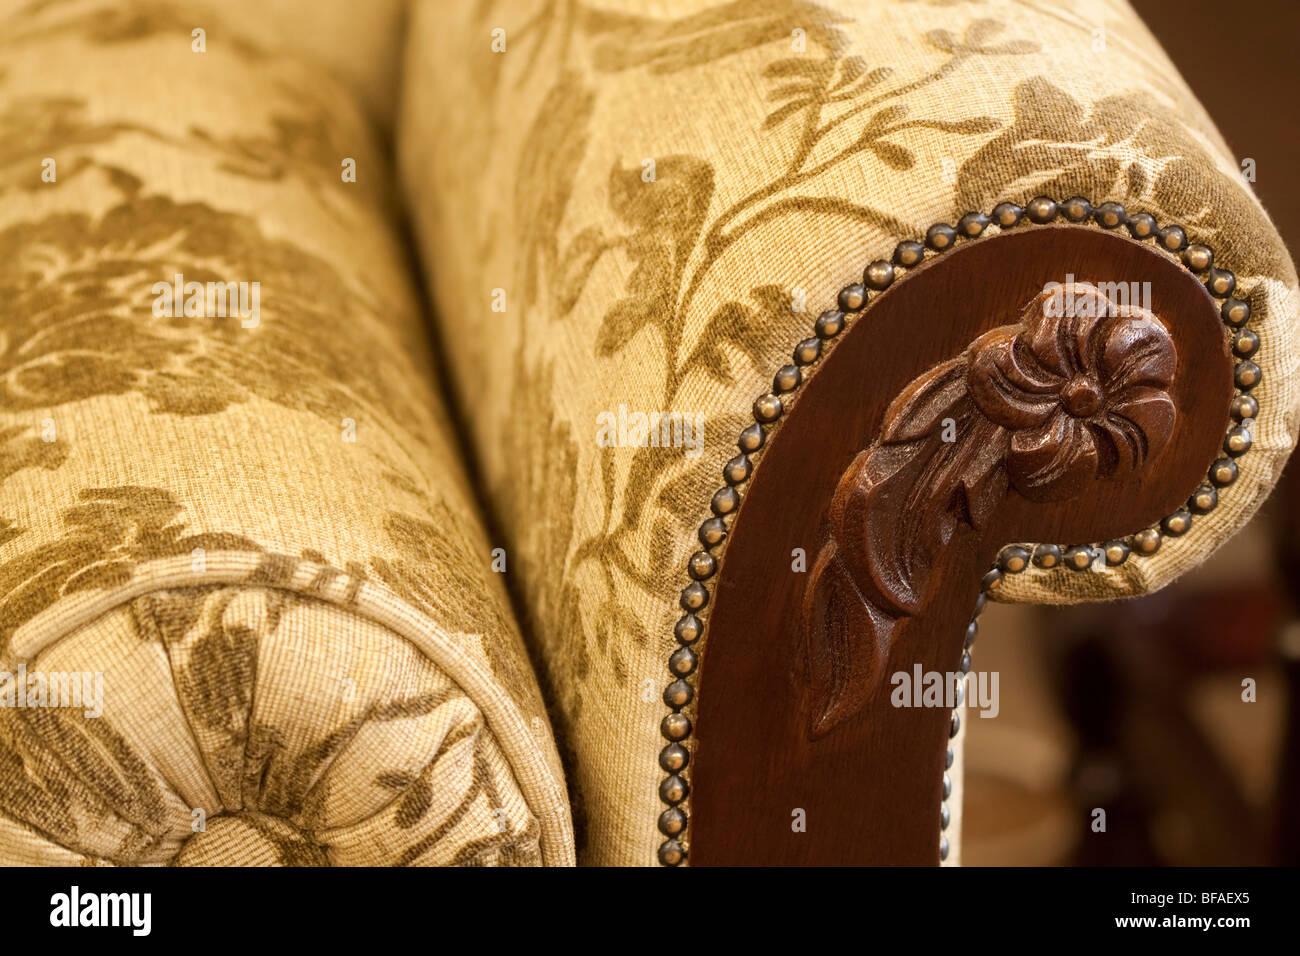 Hard carved armrest on upholstered couch. - Stock Image